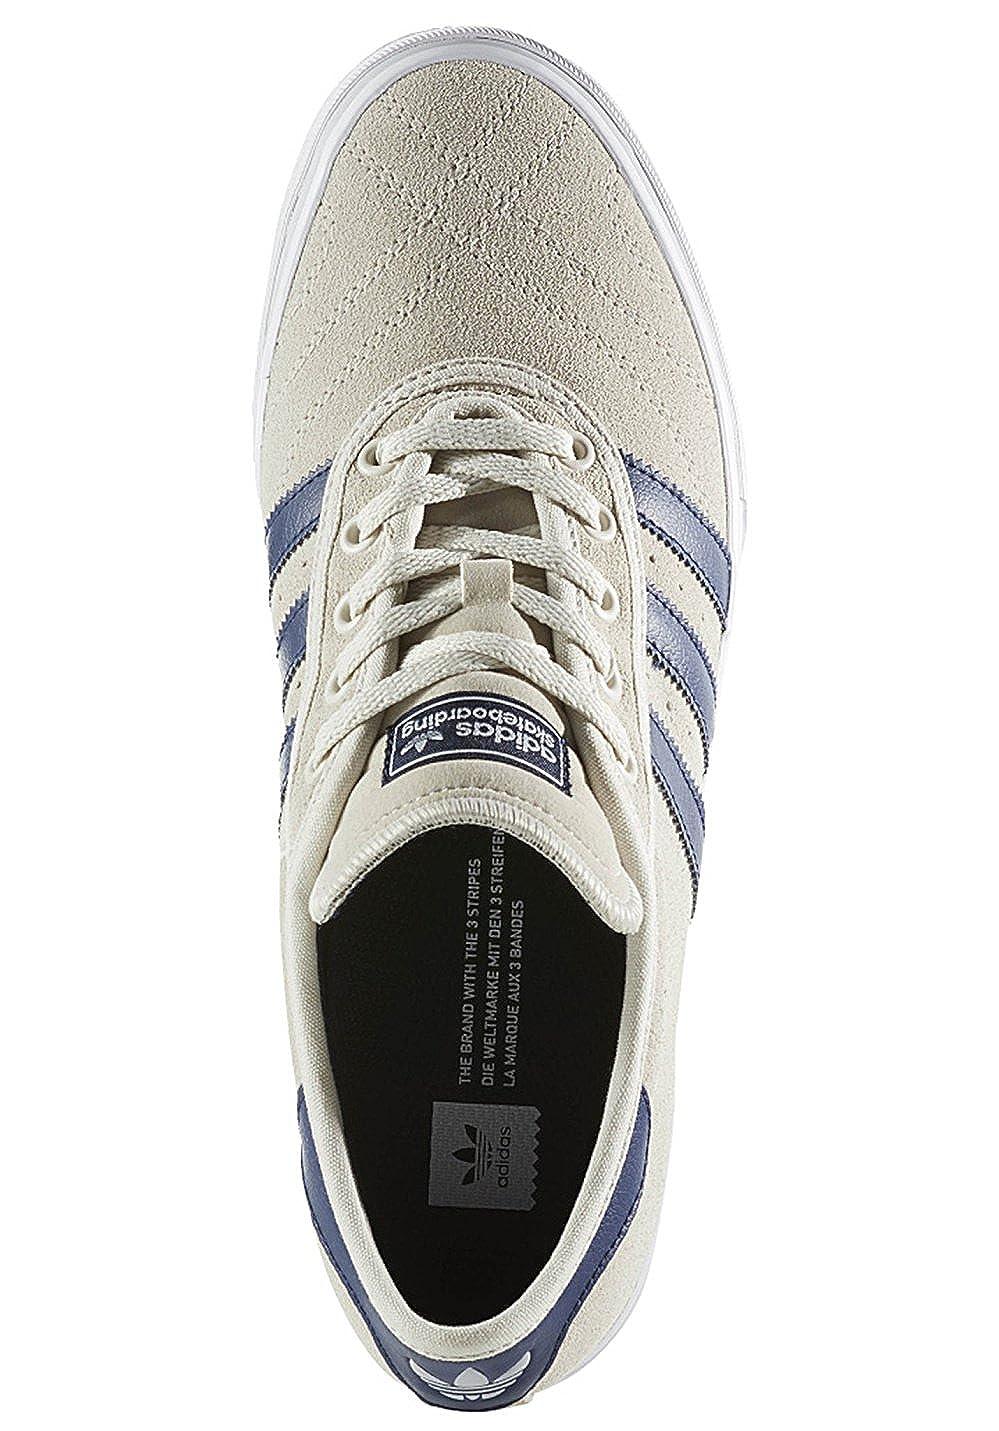 reputable site fe26e 0a53a adidas Adi-Ease Premiere Chaussures de Skateboard Homme  Amazon.fr   Chaussures et Sacs